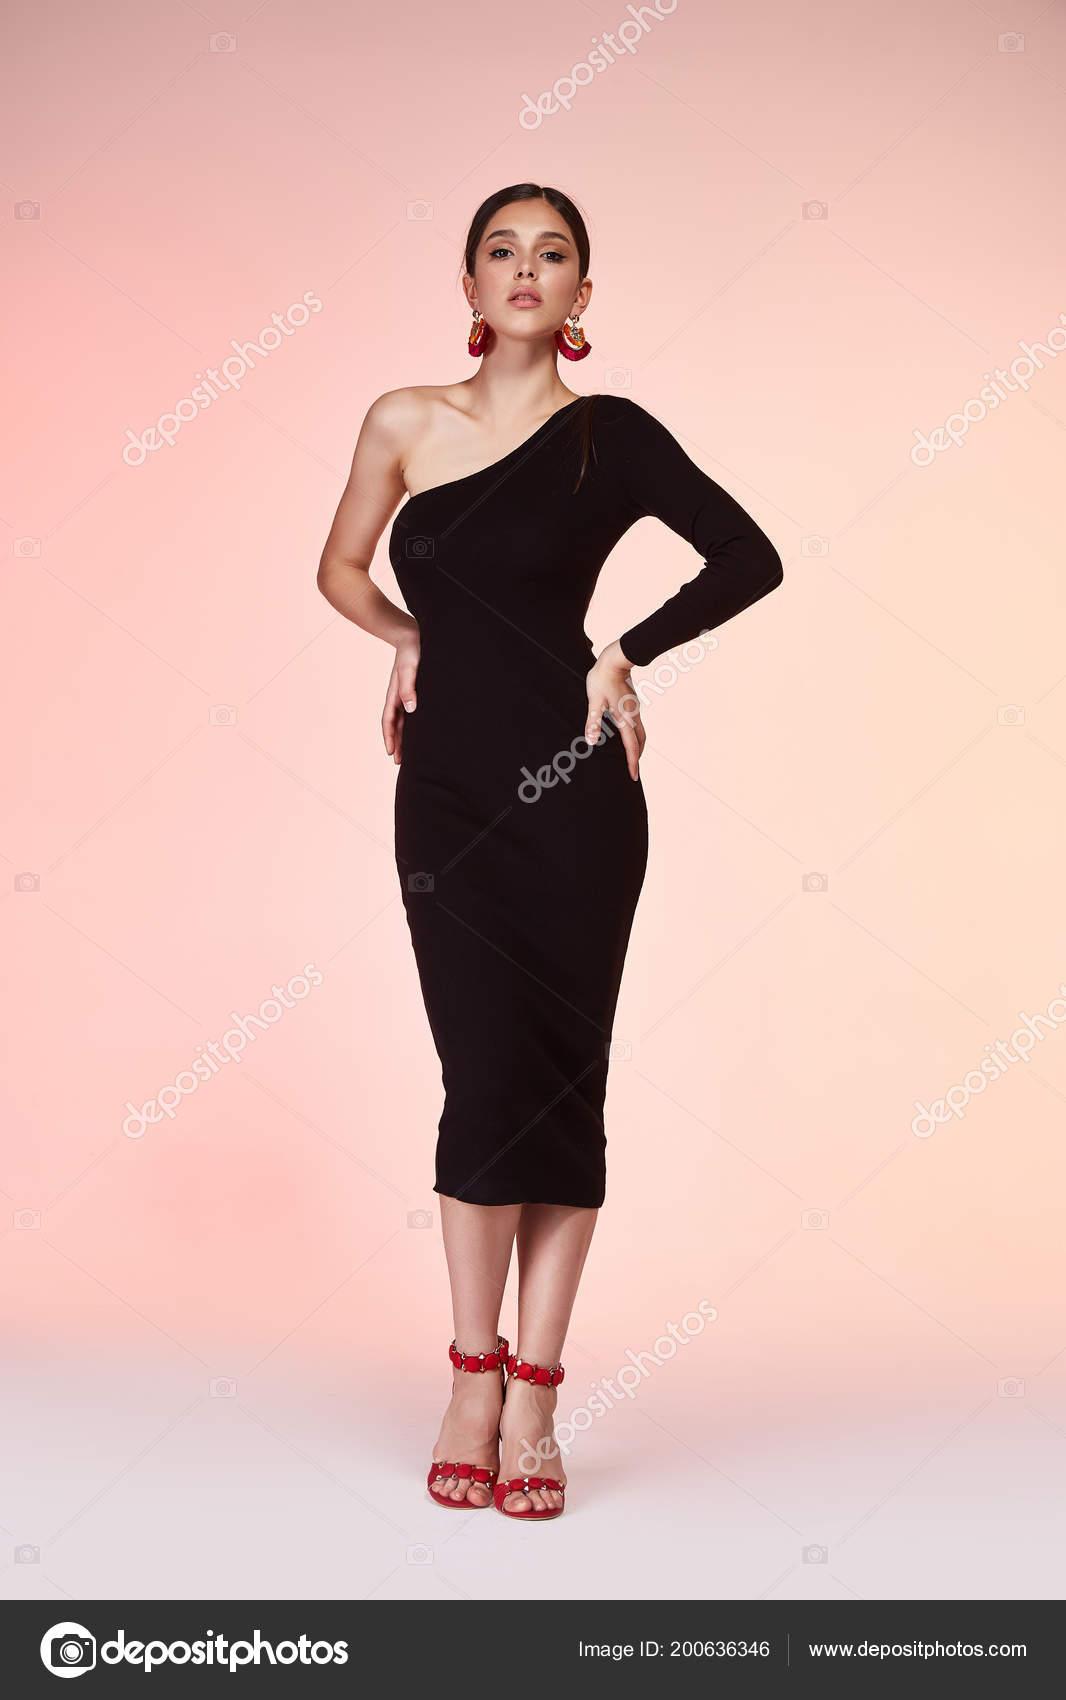 Moda Estilo Mujer Cuerpo Perfecto Forma Morena Cabello Usar Skinny ...